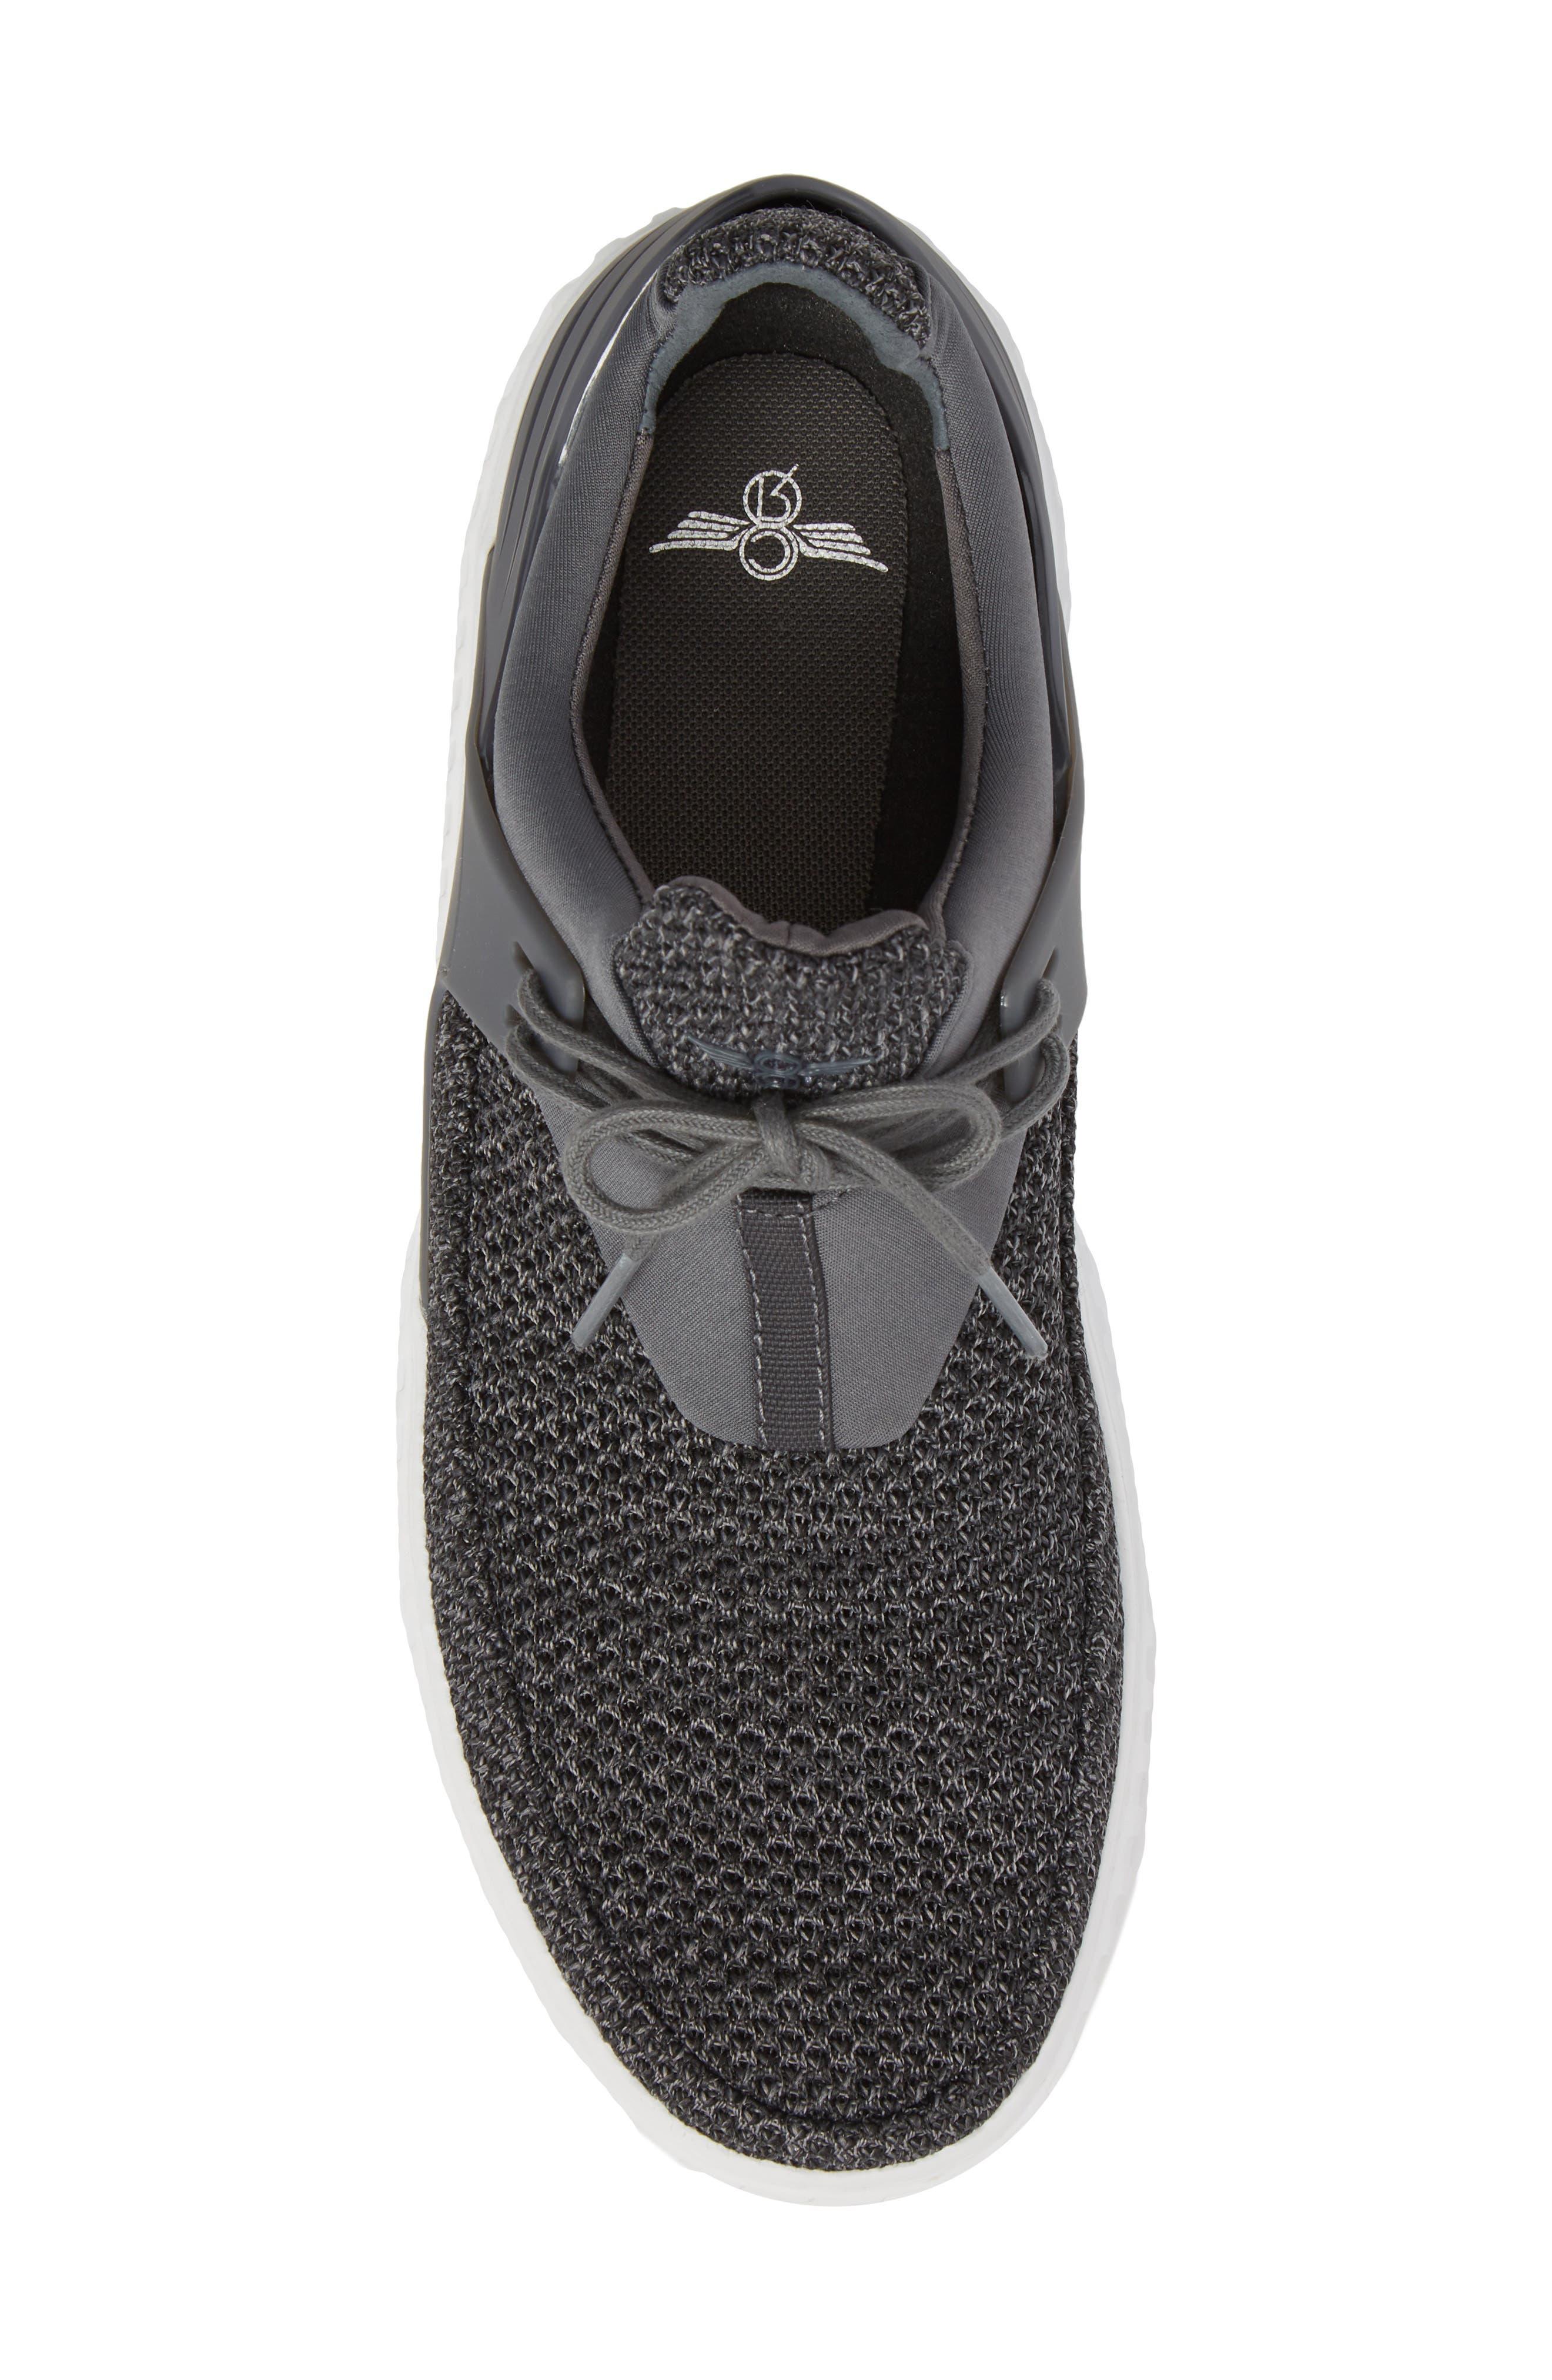 Castucci Knit Sneaker,                             Alternate thumbnail 5, color,                             021